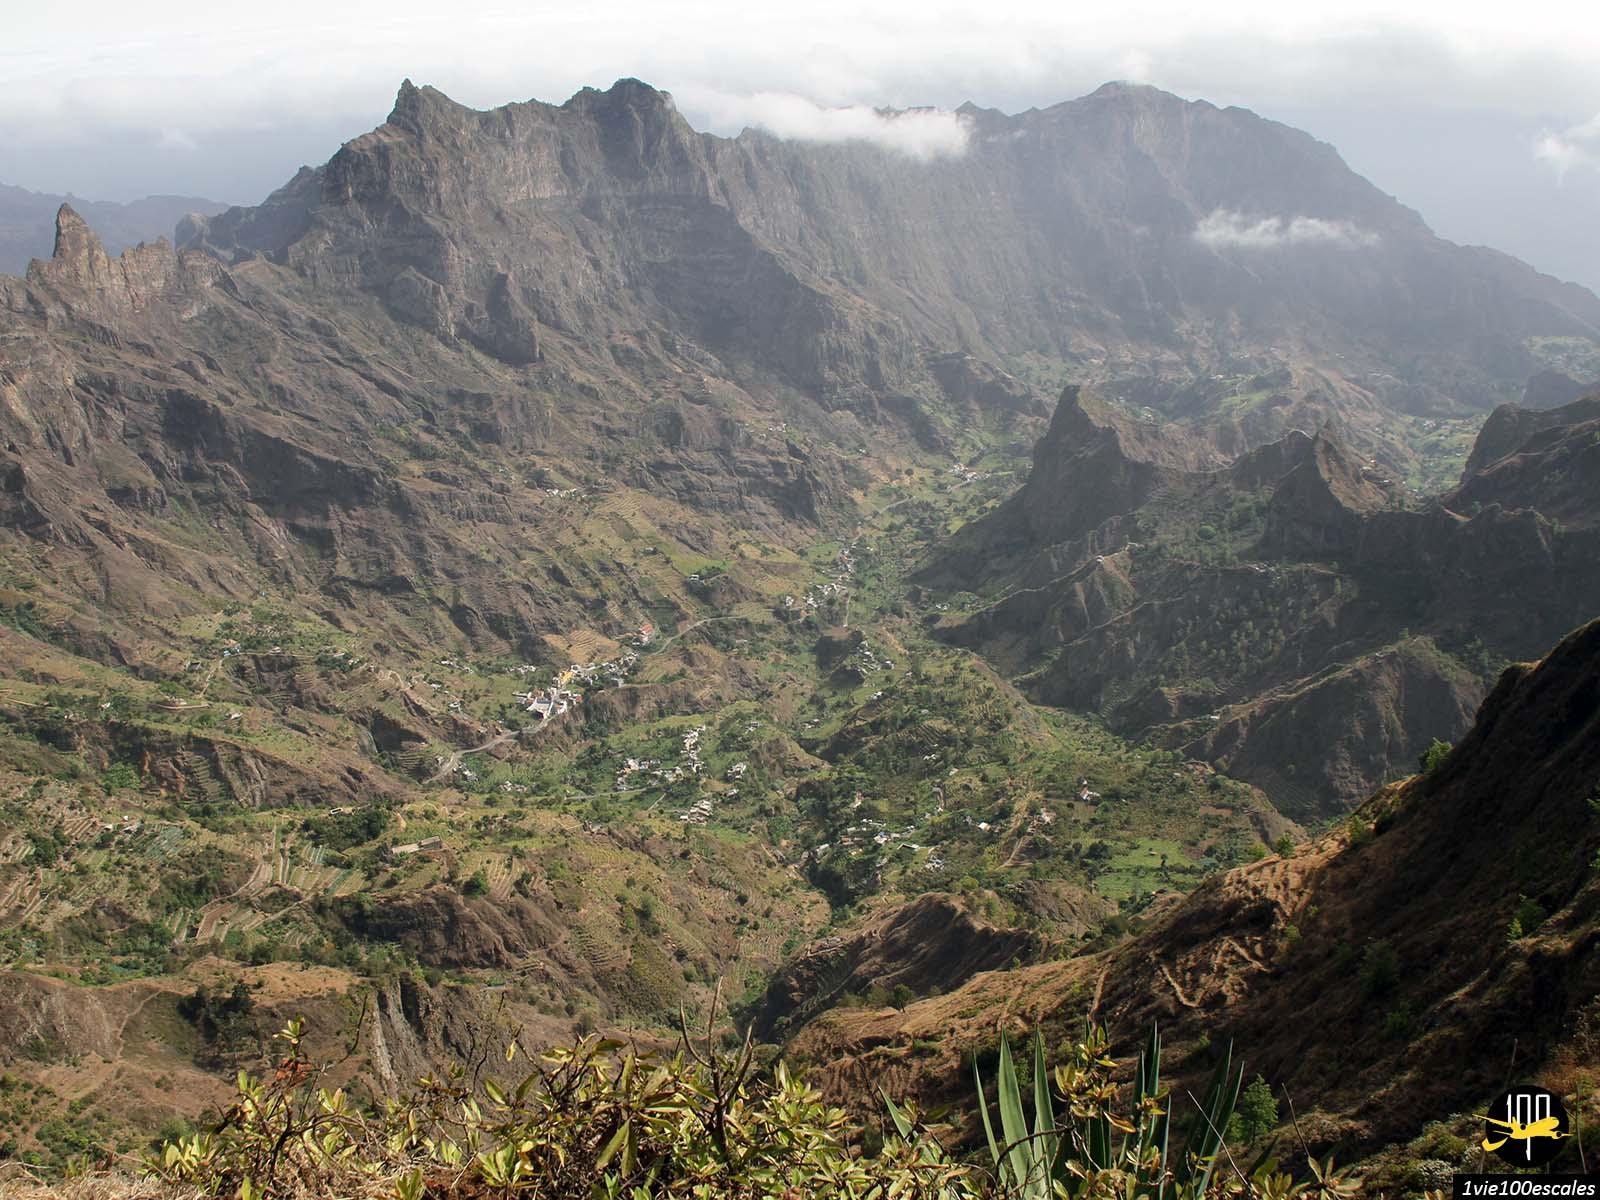 La vue sur les montagnes depuis le pico da cruz de santo antao